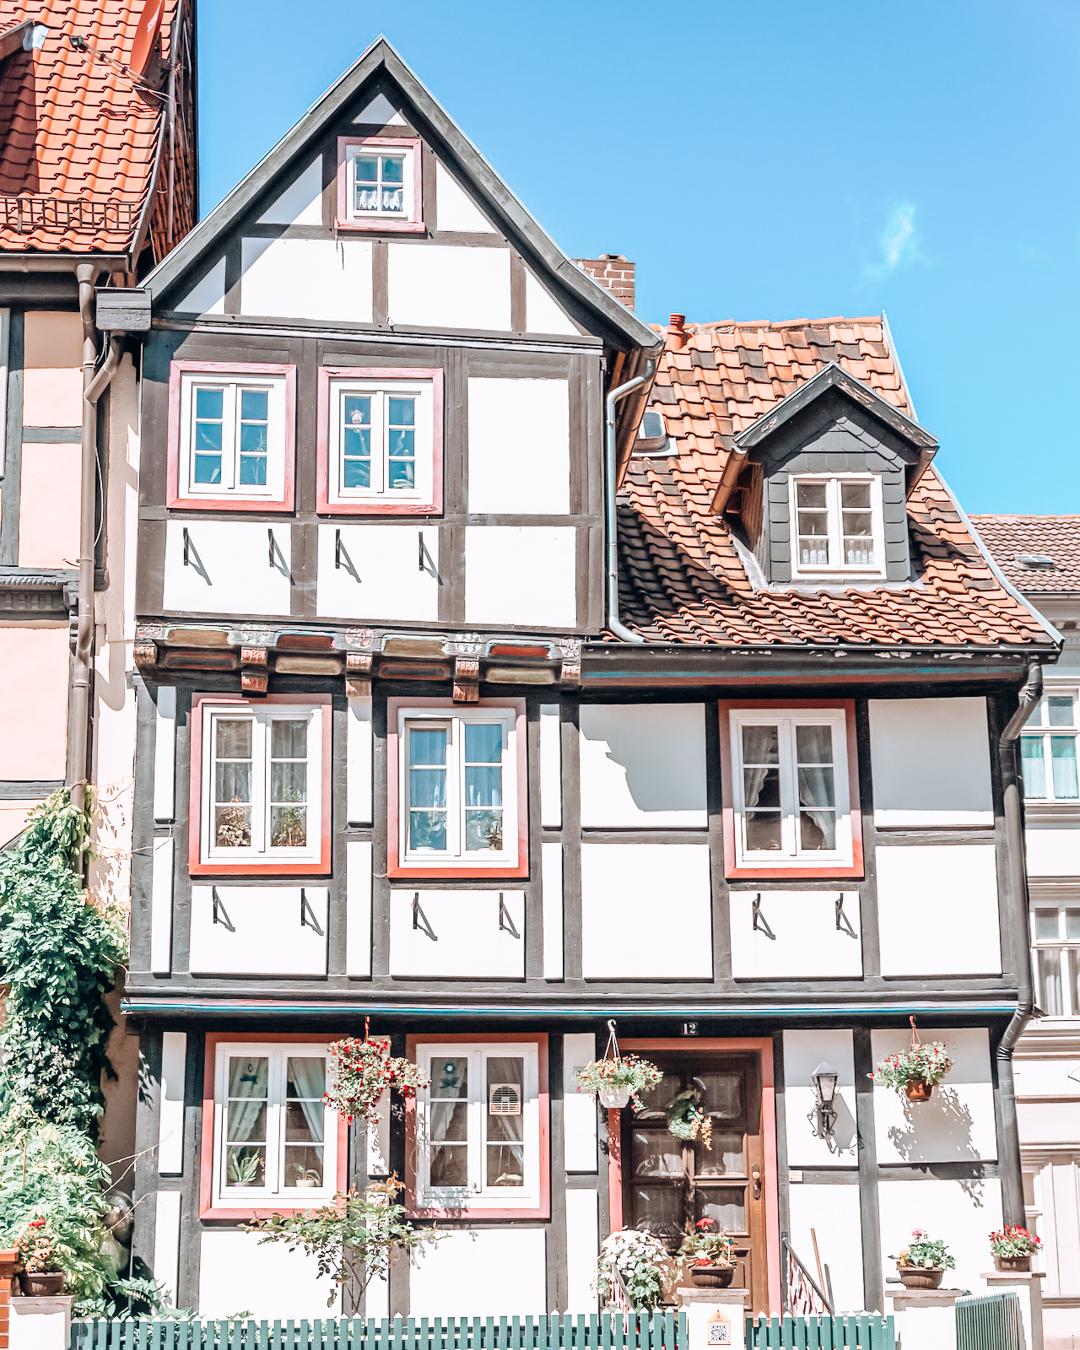 A building in Quedlinburg